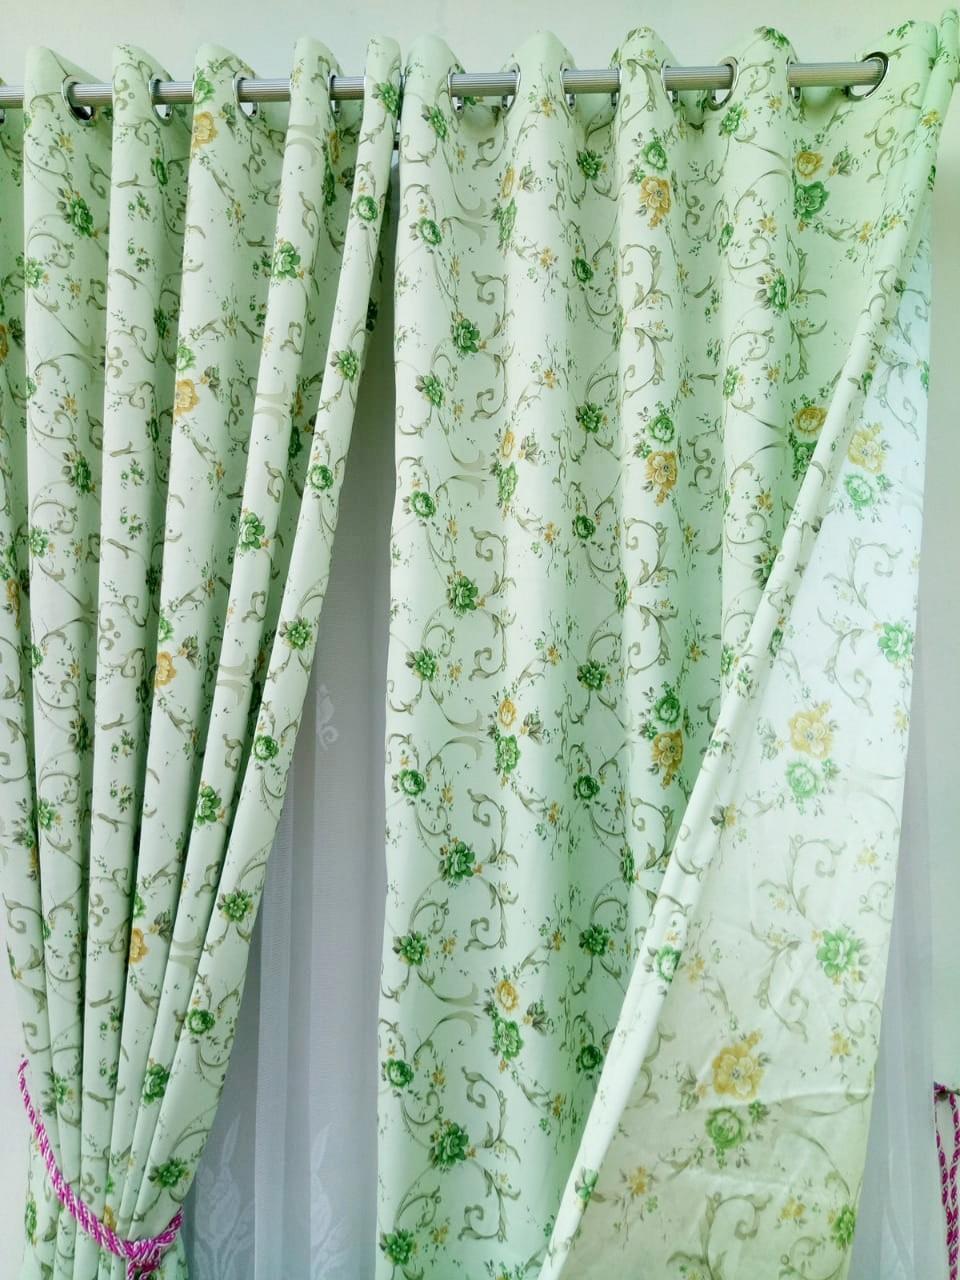 Detail Gambar Gorden blackout shabby chic hijau motif bunga kecil tirai jendela pintu minimalis murah dekorasi